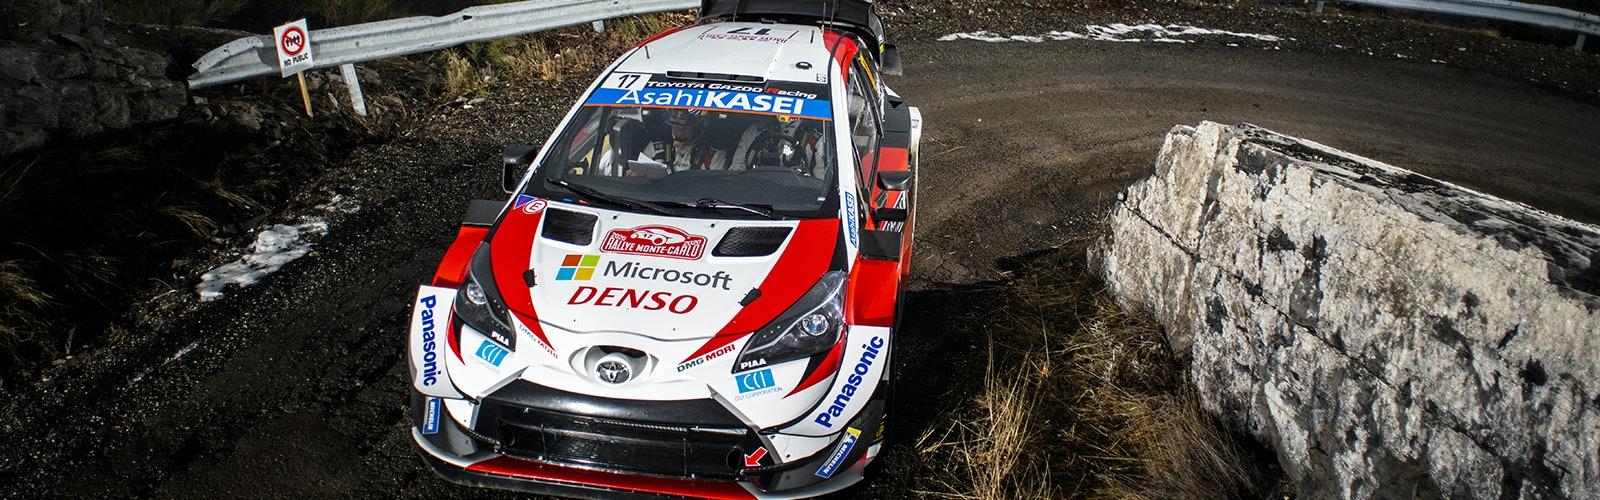 Sebastien Ogier Toyota Monte Carlo Rally 2020